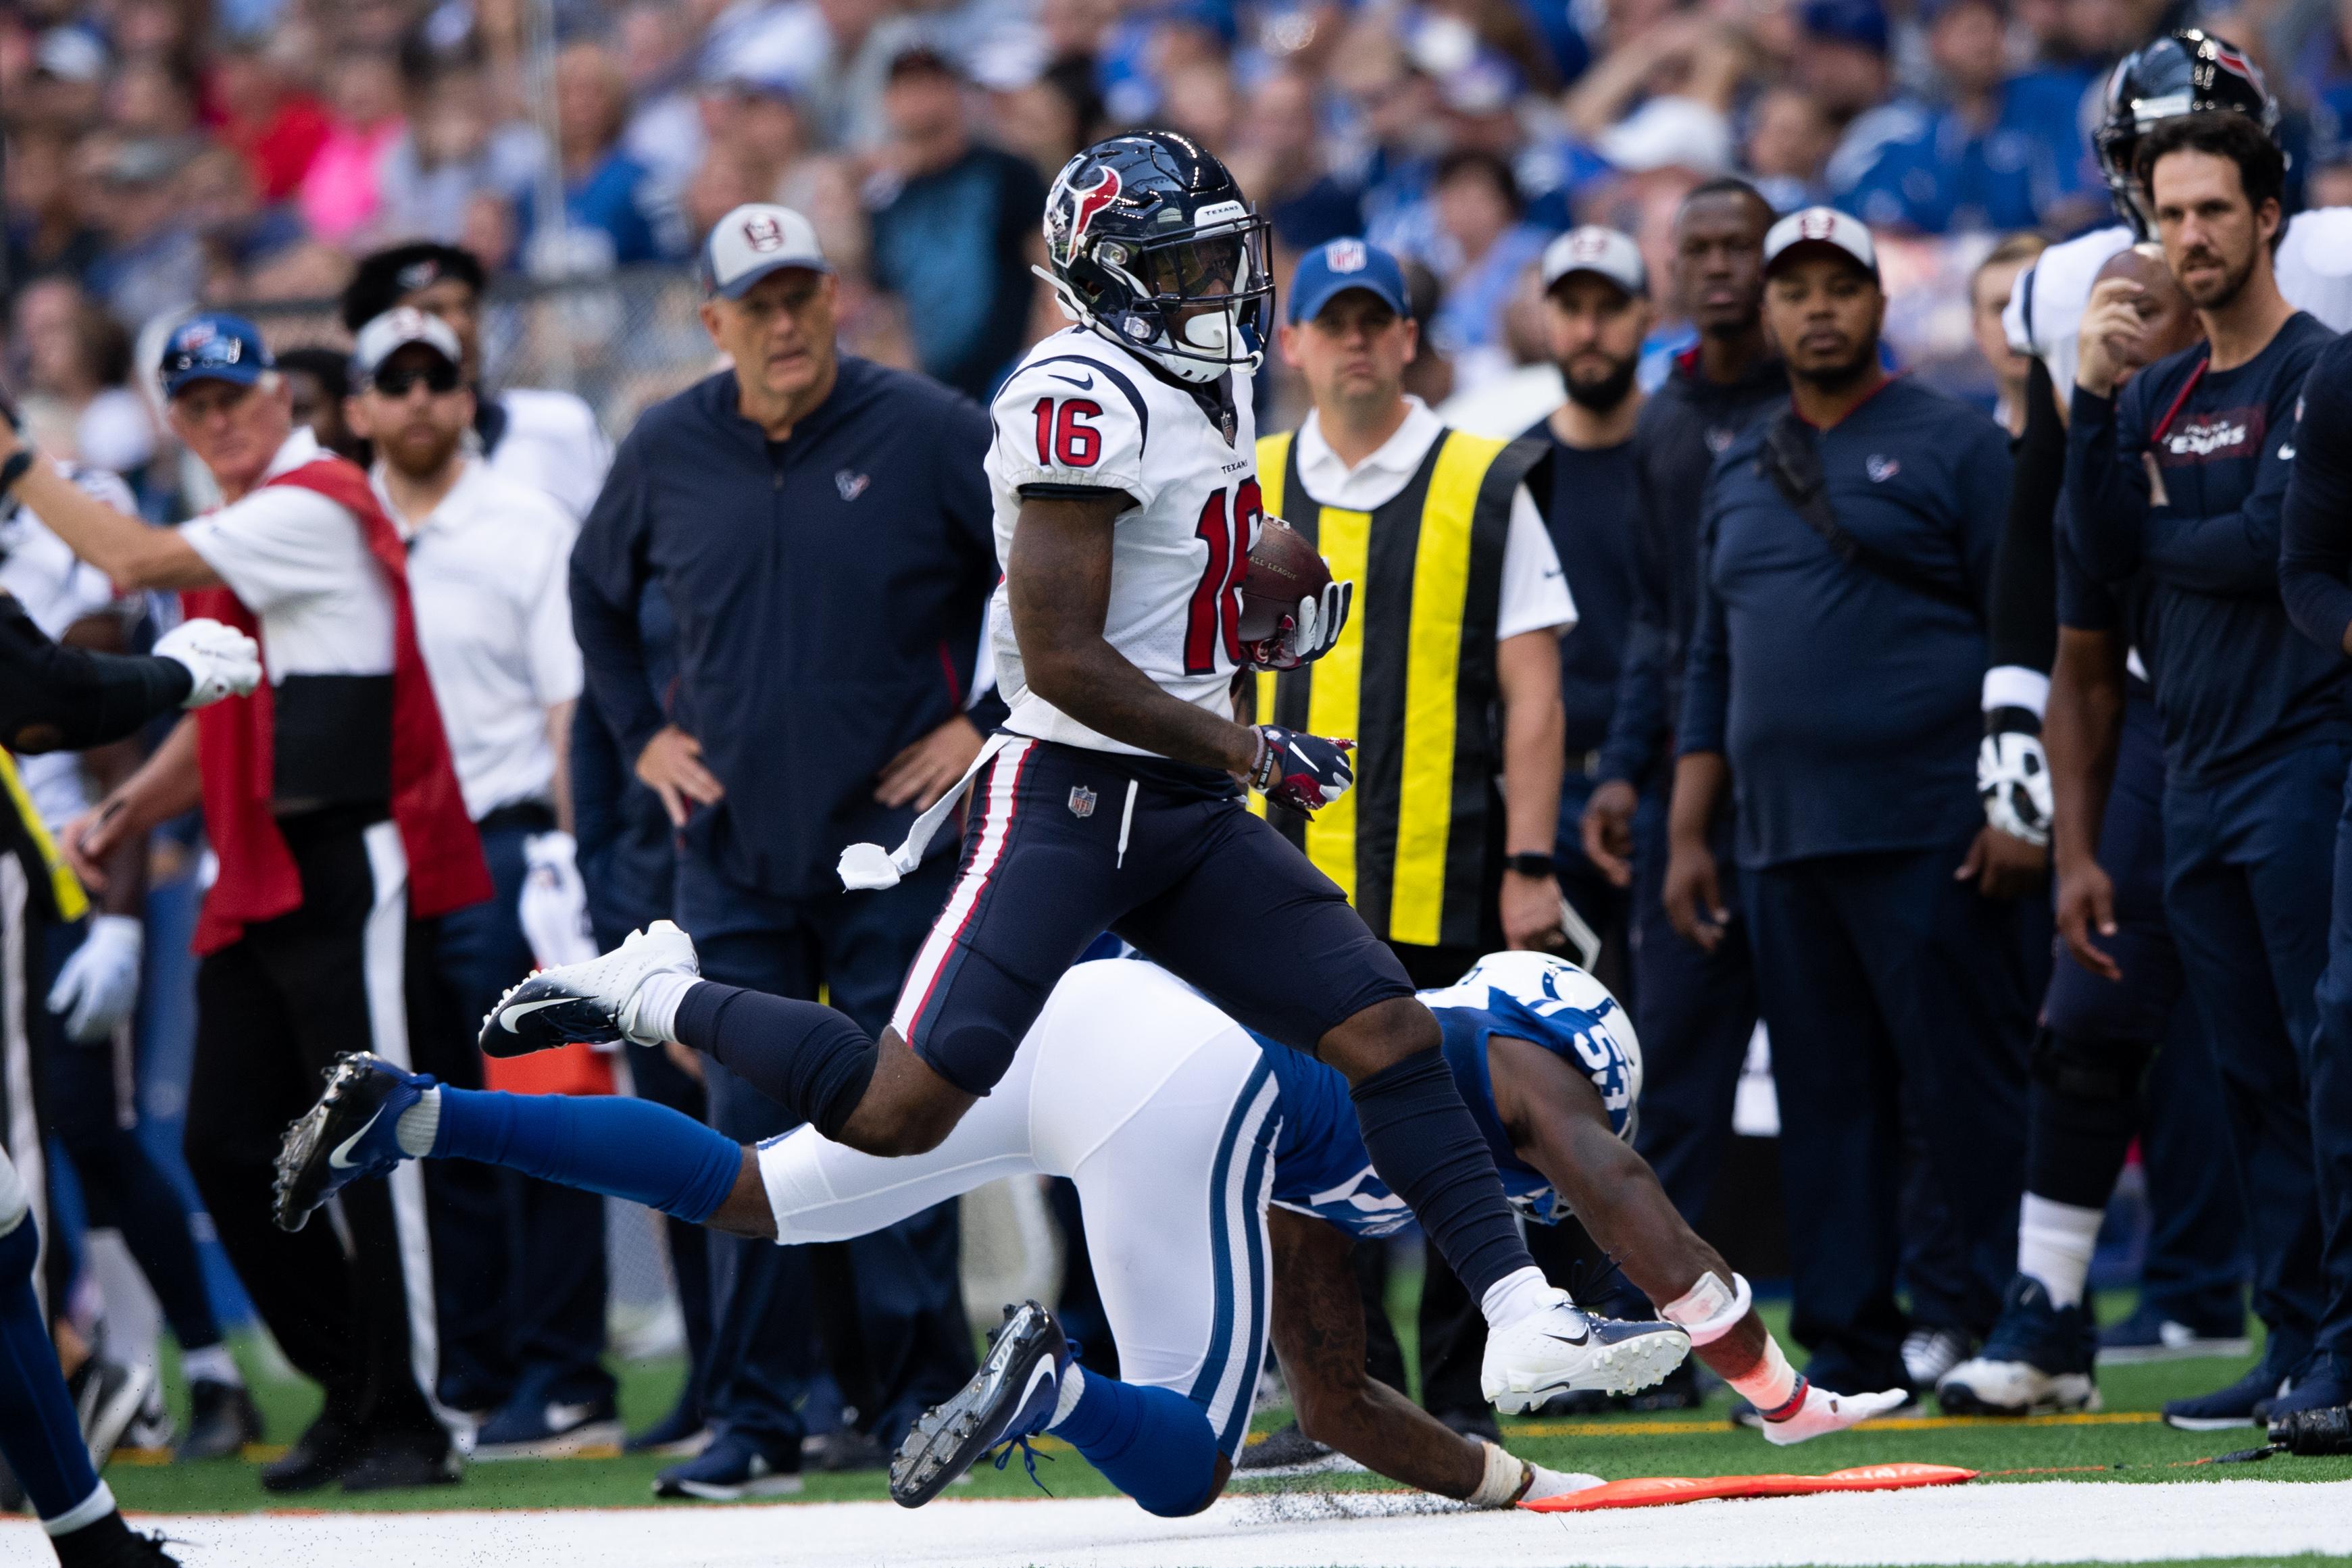 NFL: SEP 30 Texans at Colts